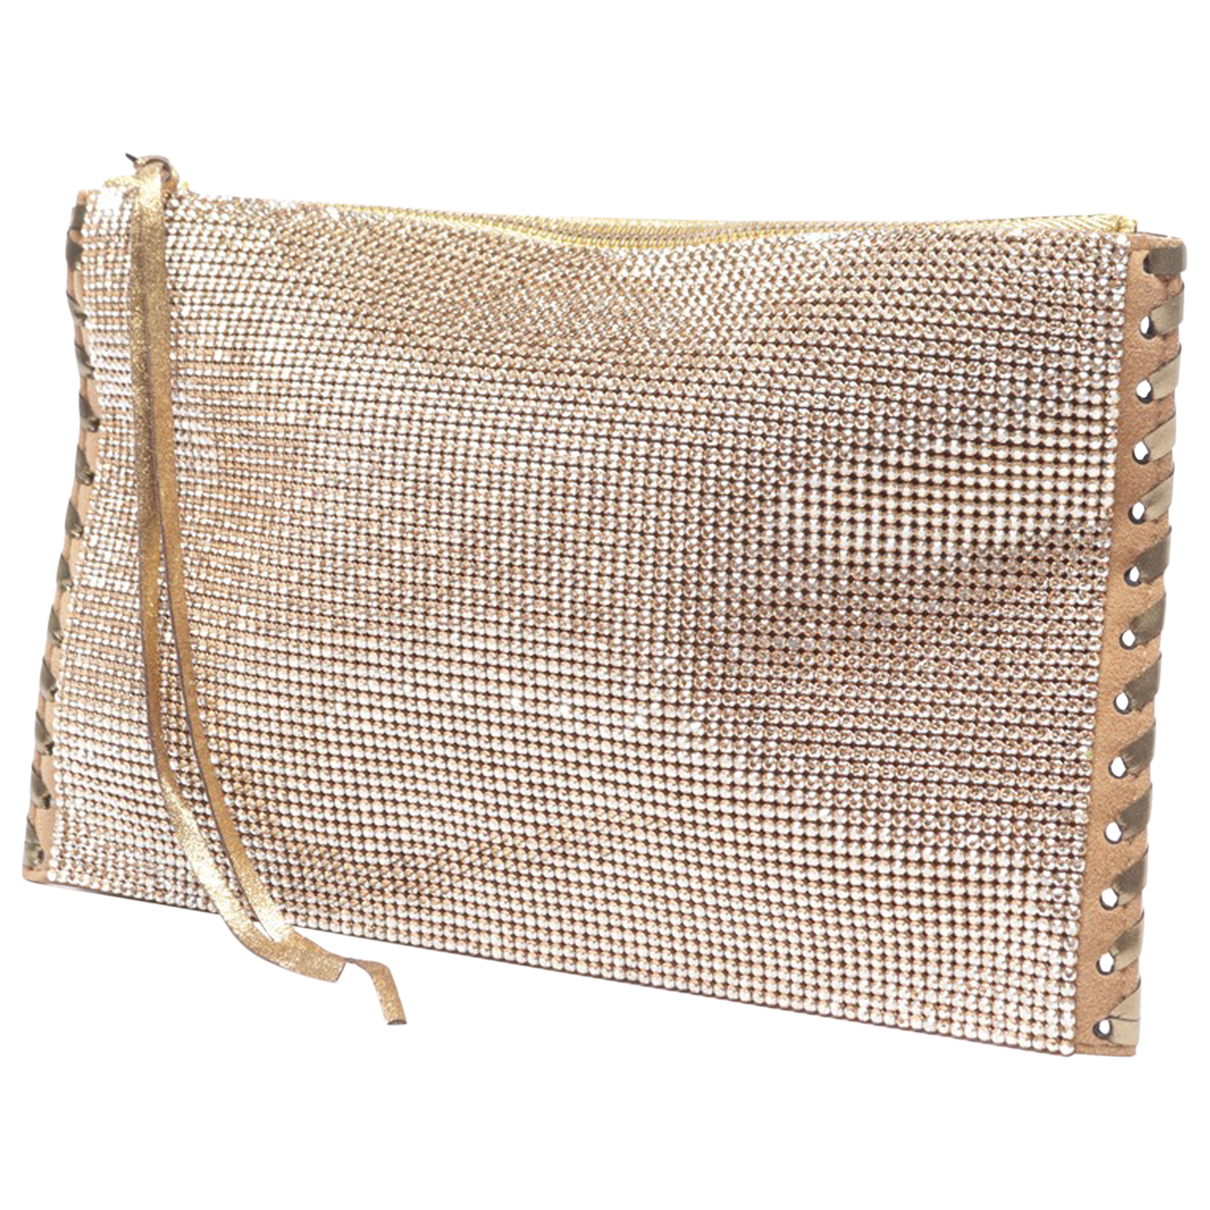 Balmain \N Metallic Leather Clutch bag for Women \N